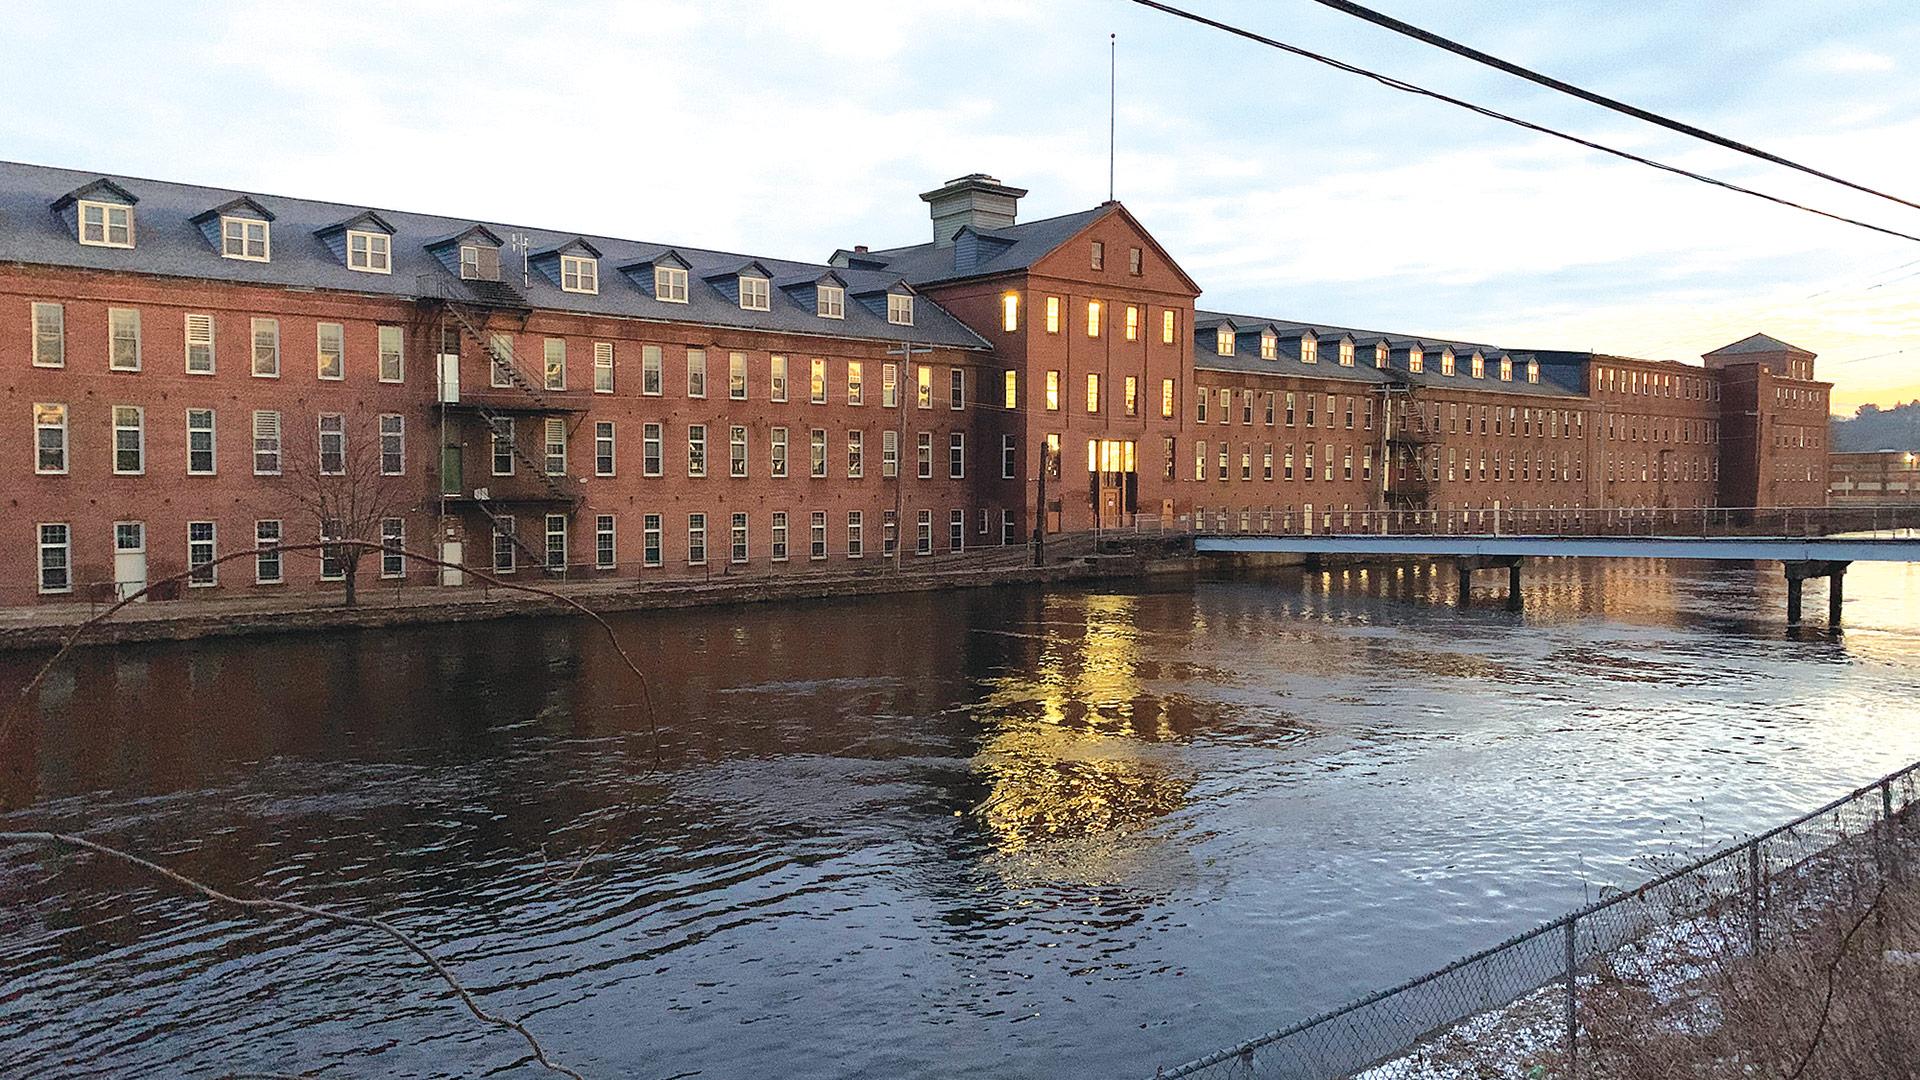 Truelieve's massive facility on Canal Street